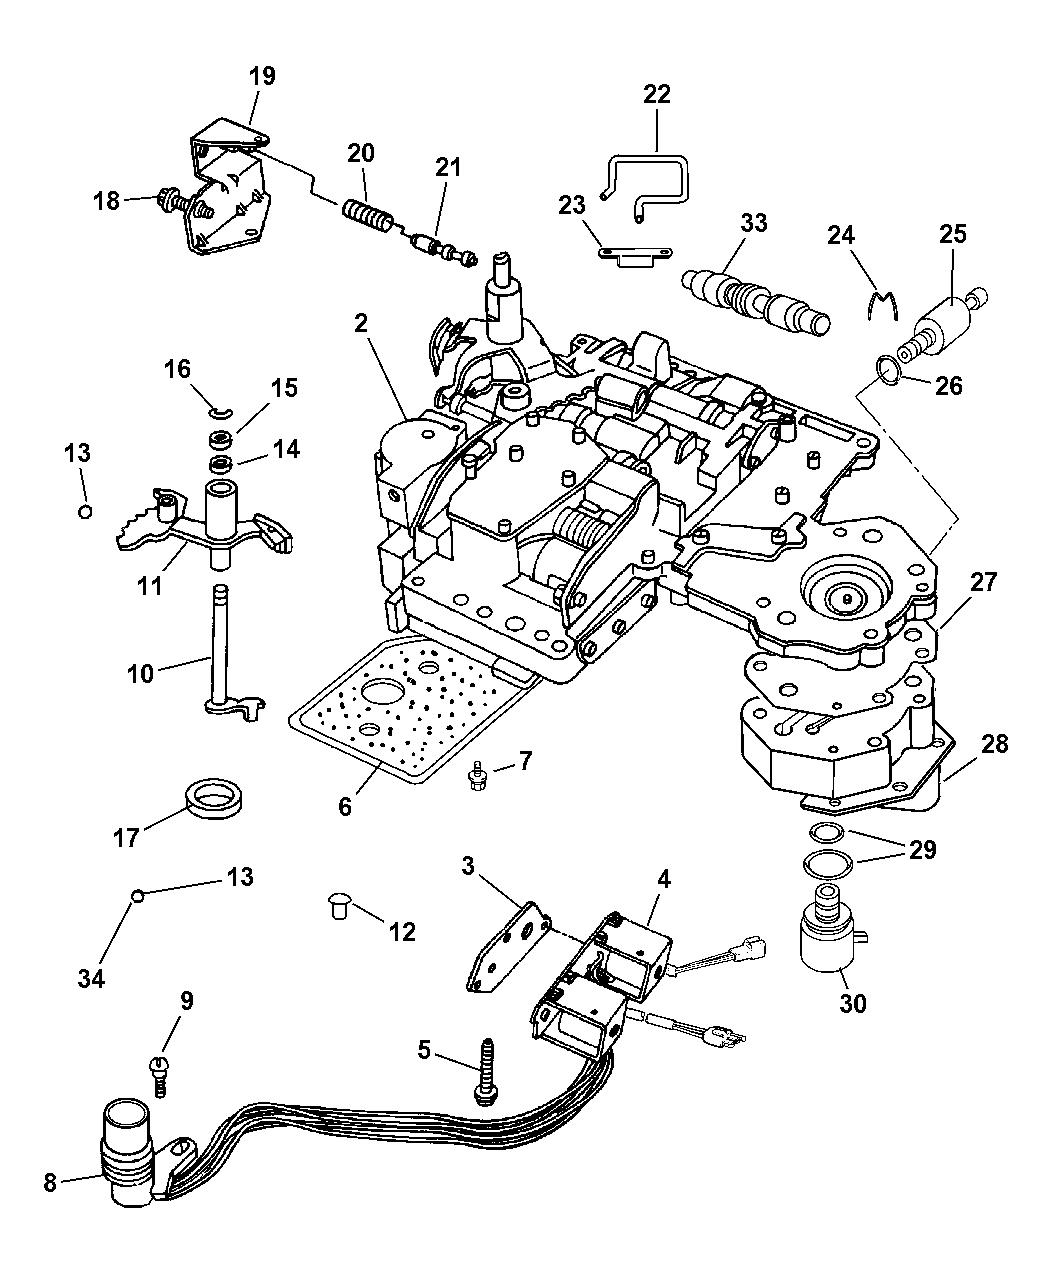 2006 Dodge Ram 1500 Valve Body Mopar Parts Giant Hemi Engine Pulley Diagram Thumbnail 3